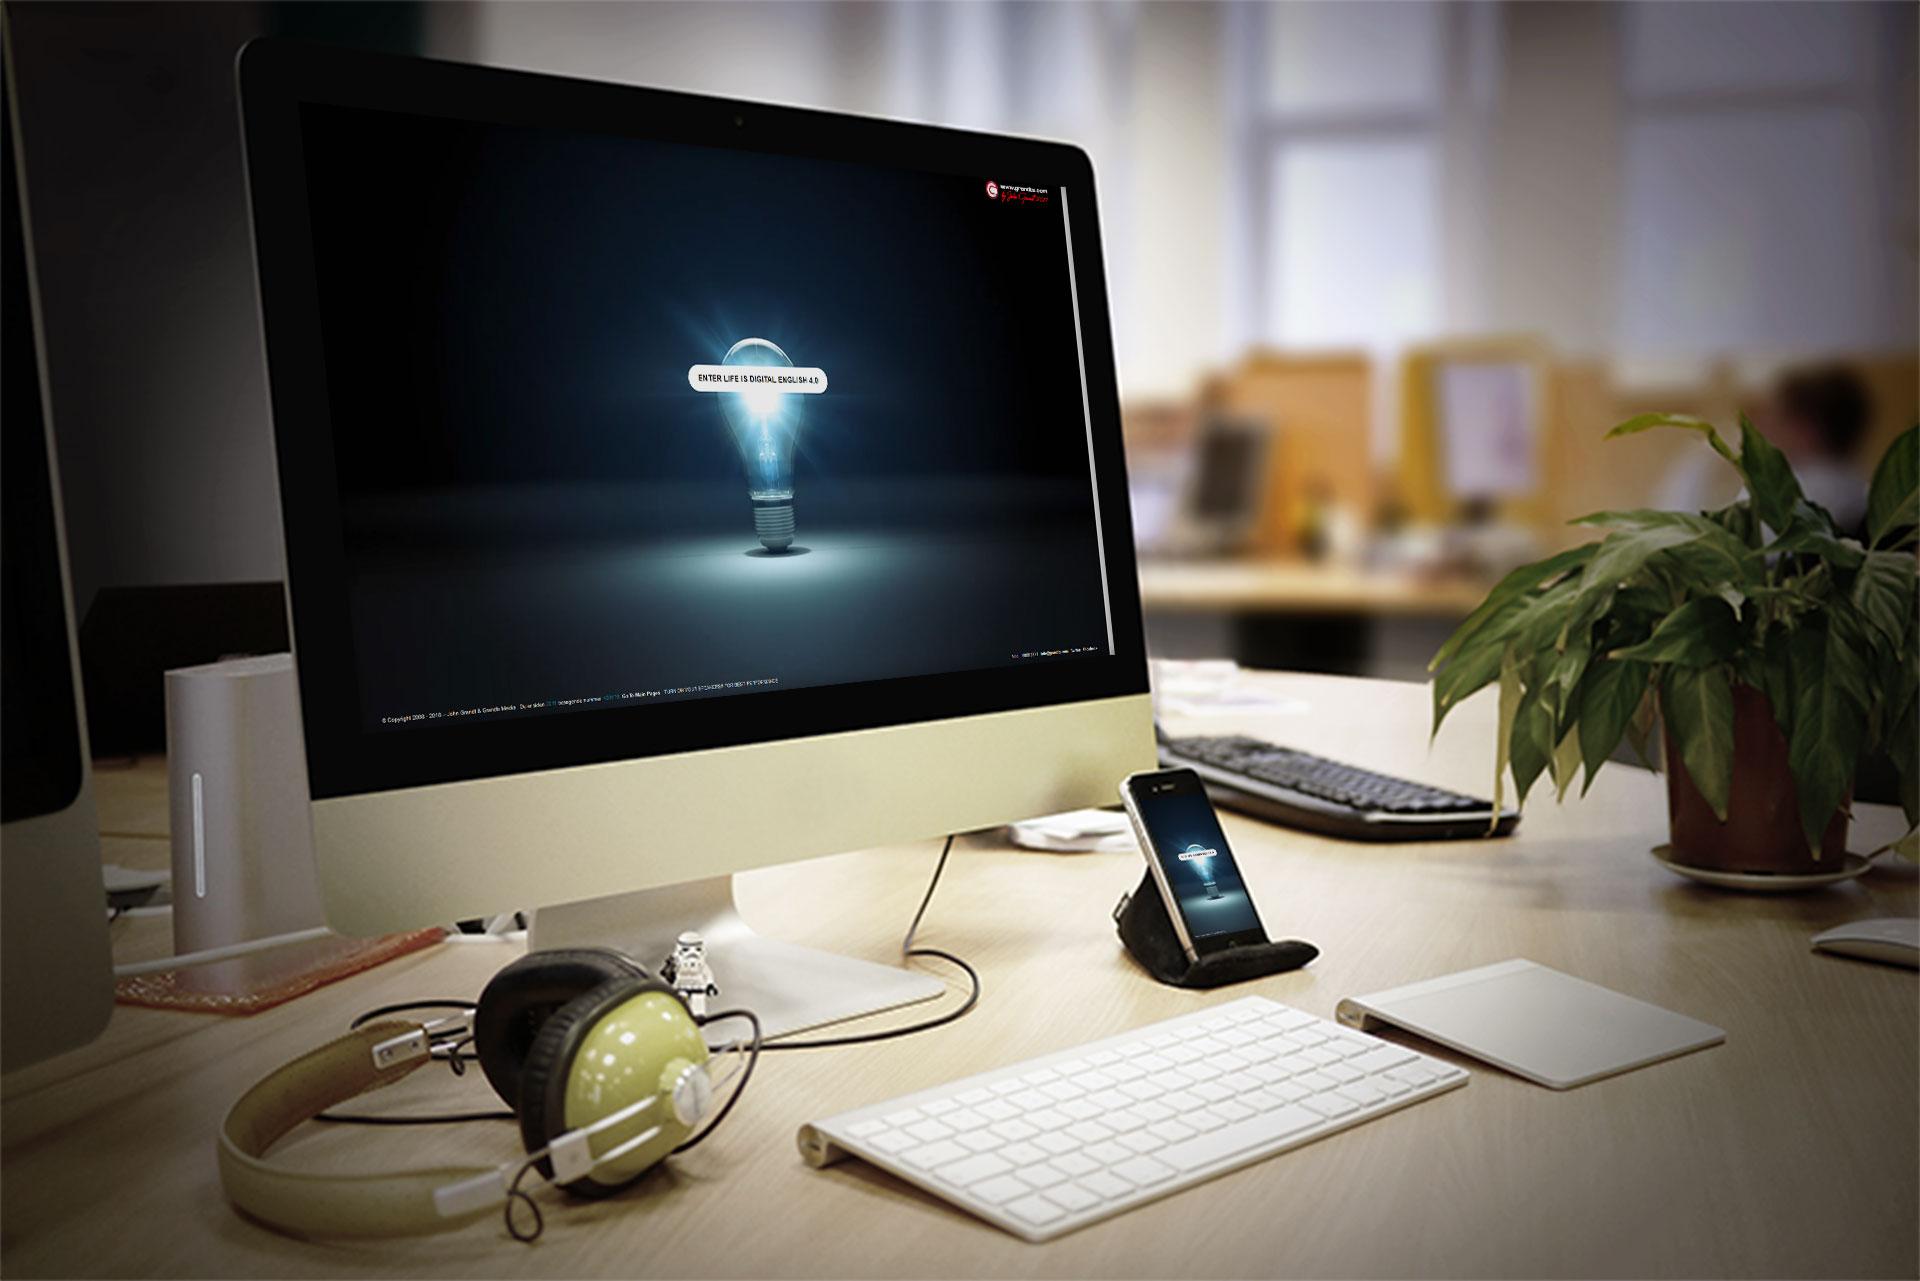 bulb-enter-english-page